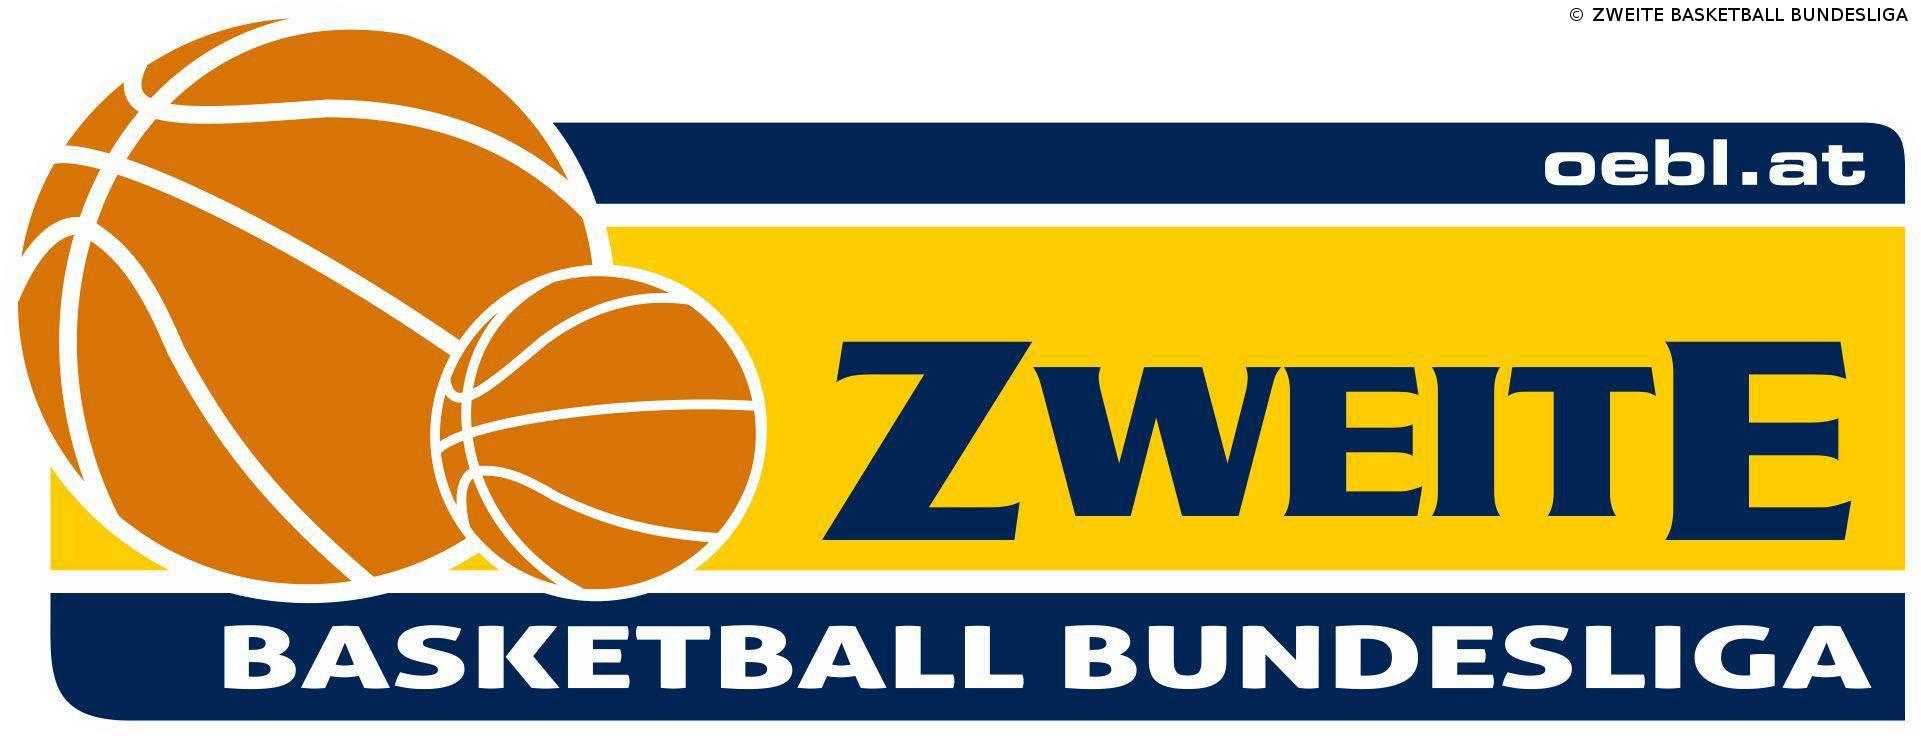 zweite bundesliga basketball